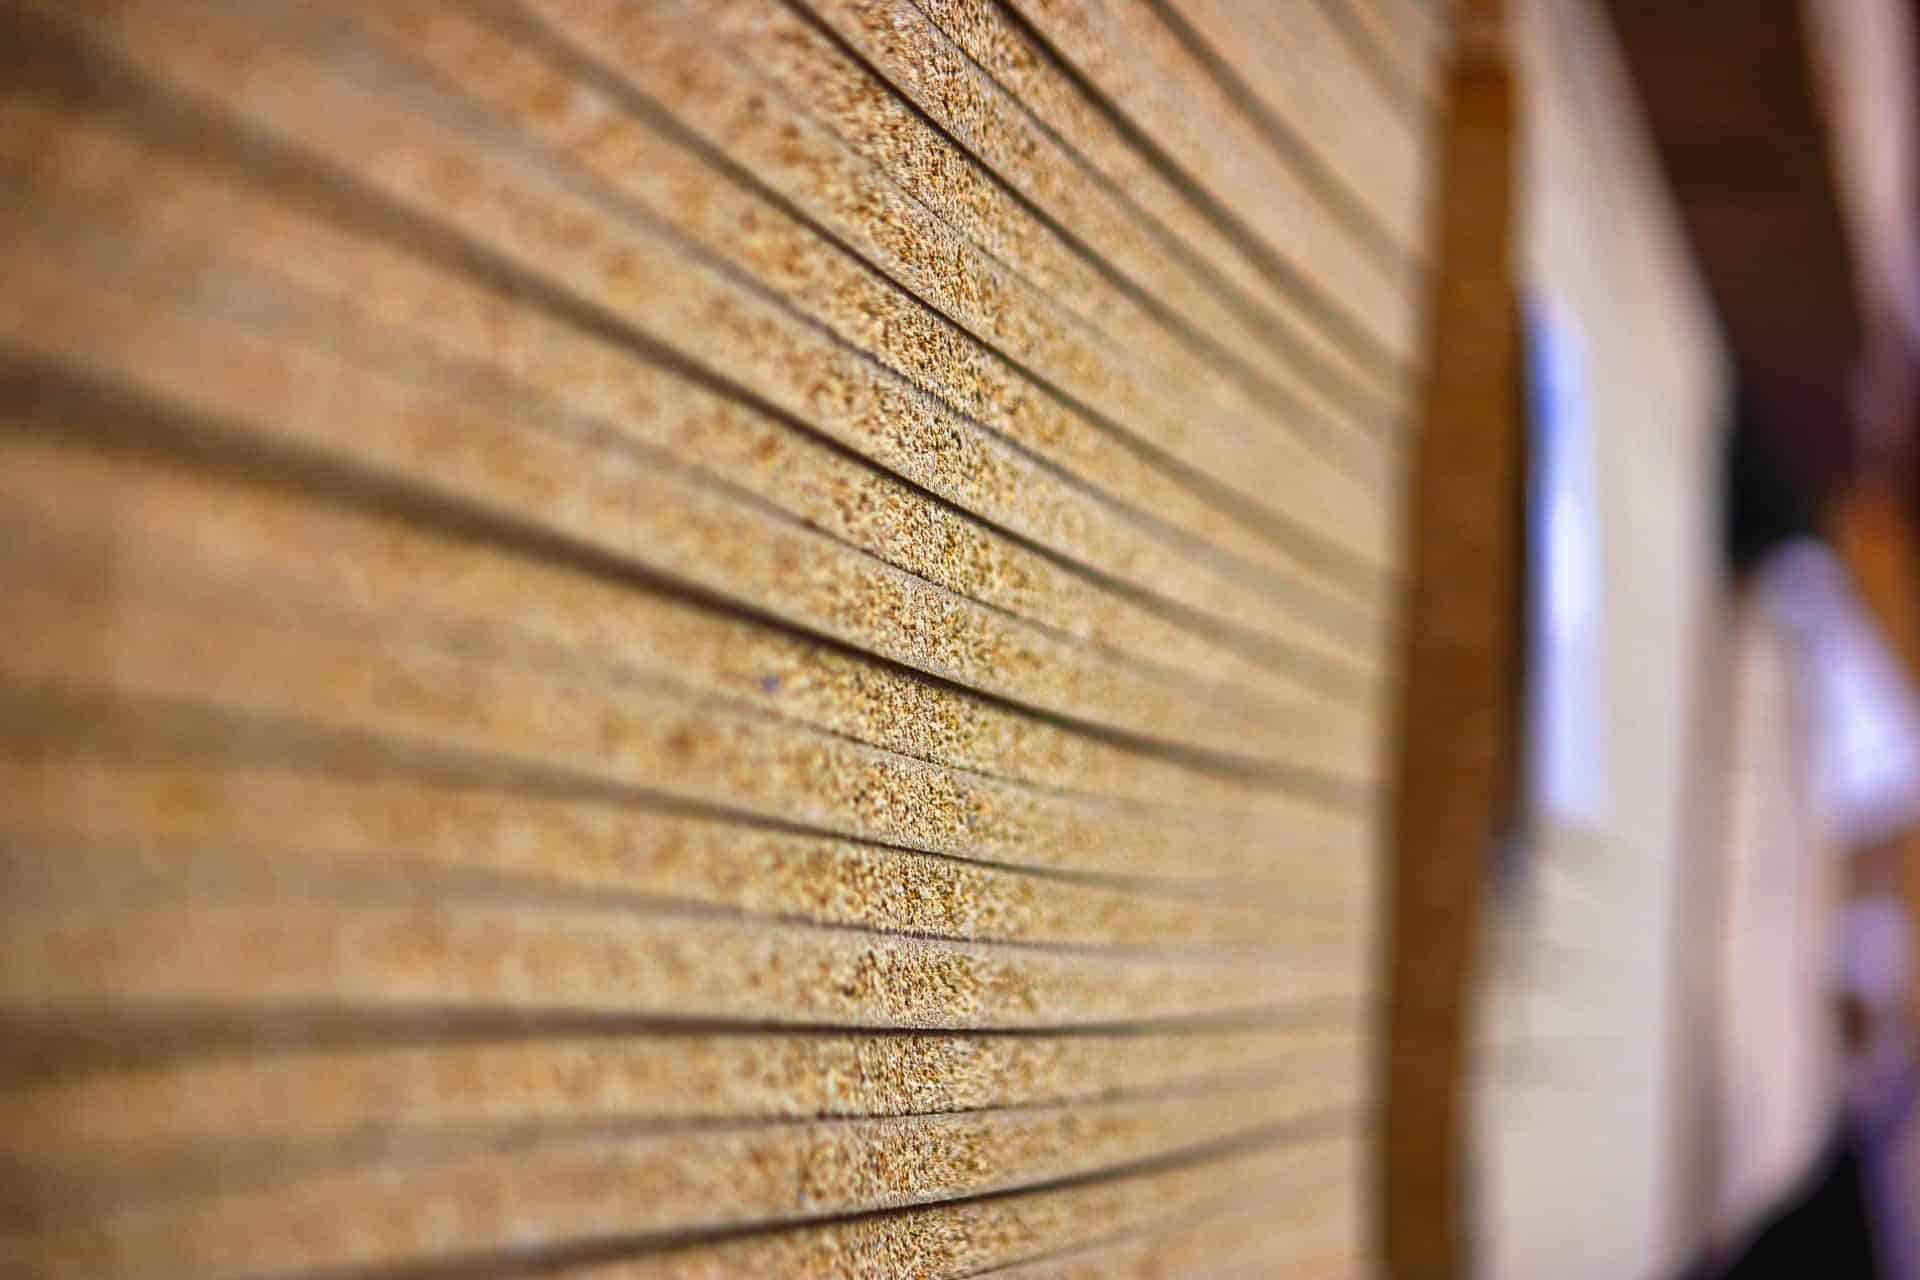 Eurospan Rohspannplatte Münker Holzhandel